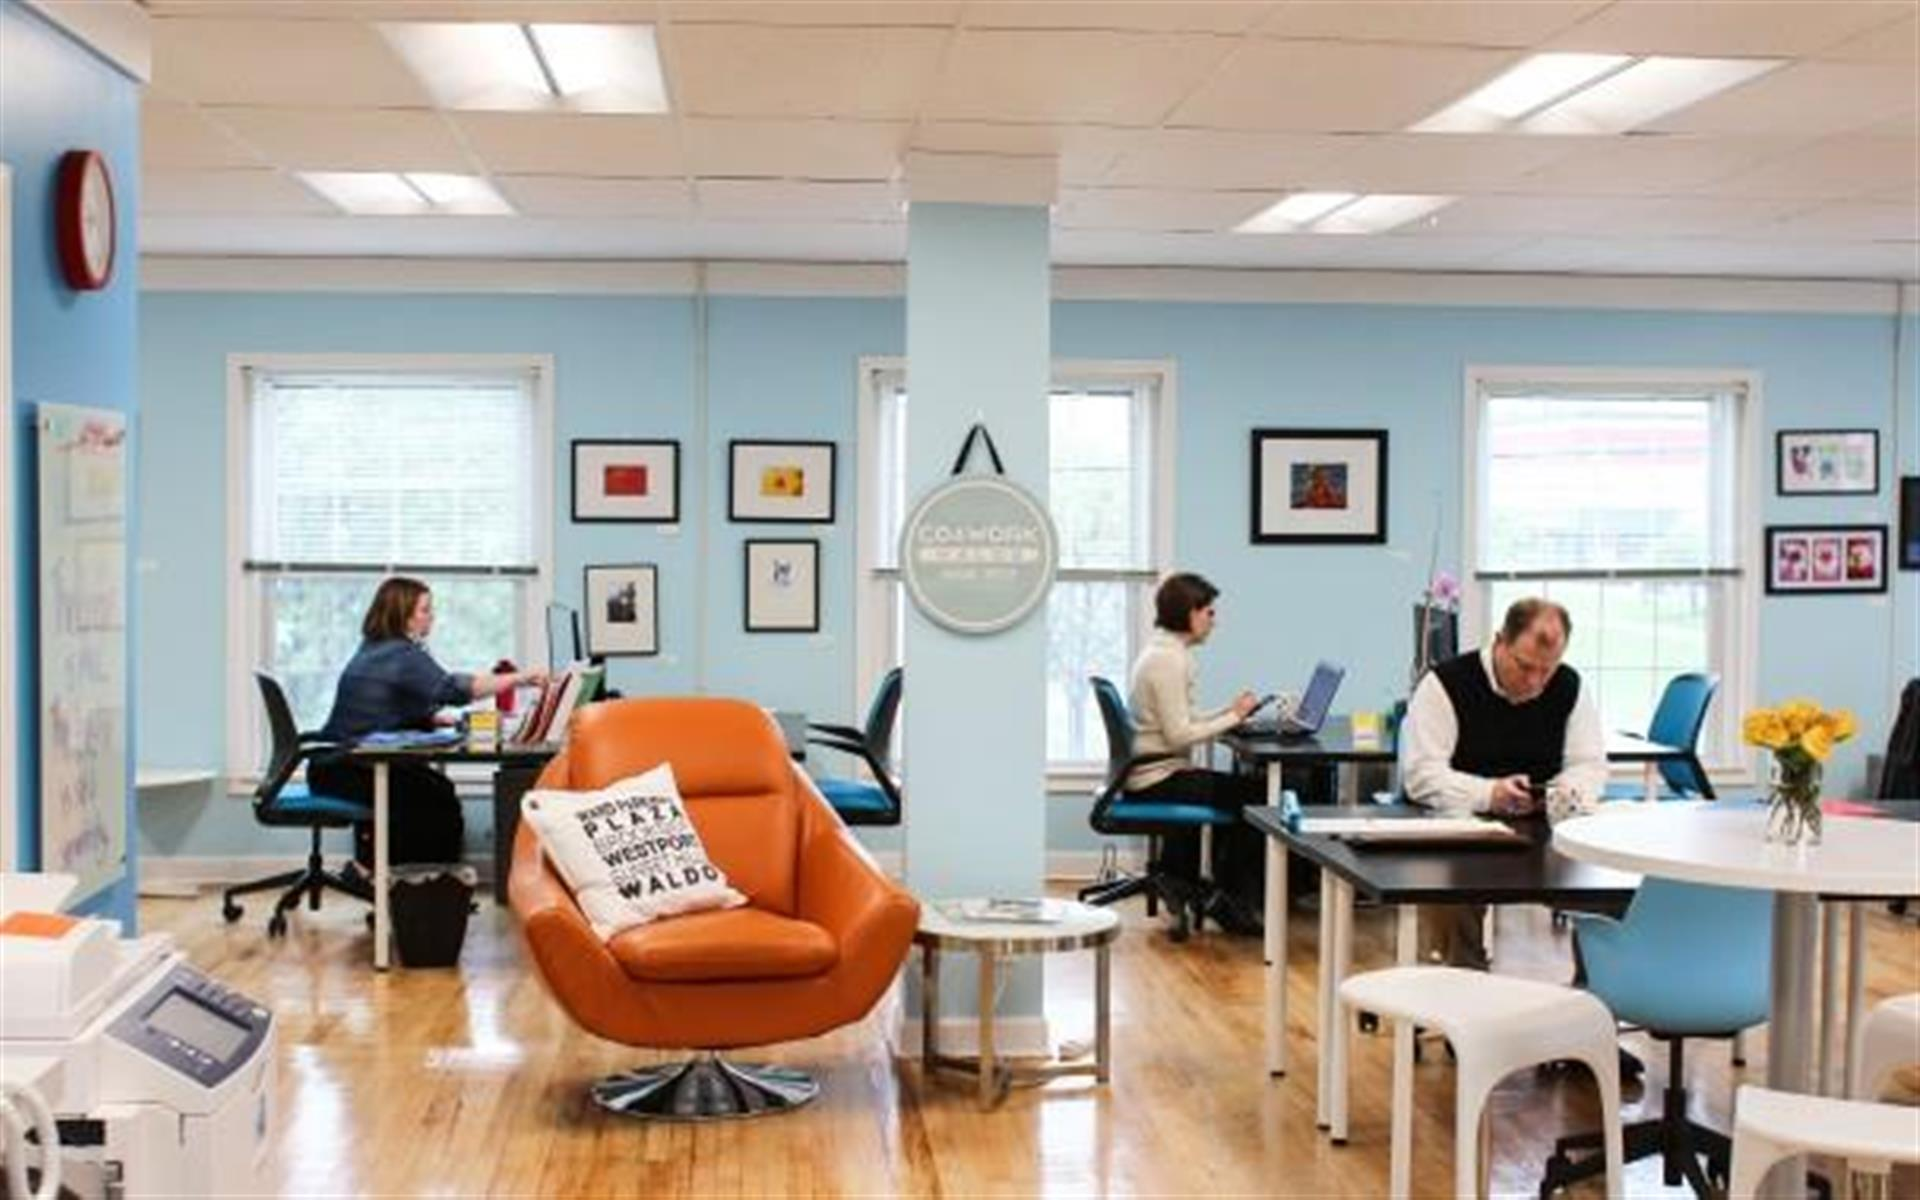 Cowork Waldo - Flex Desk Full-Time